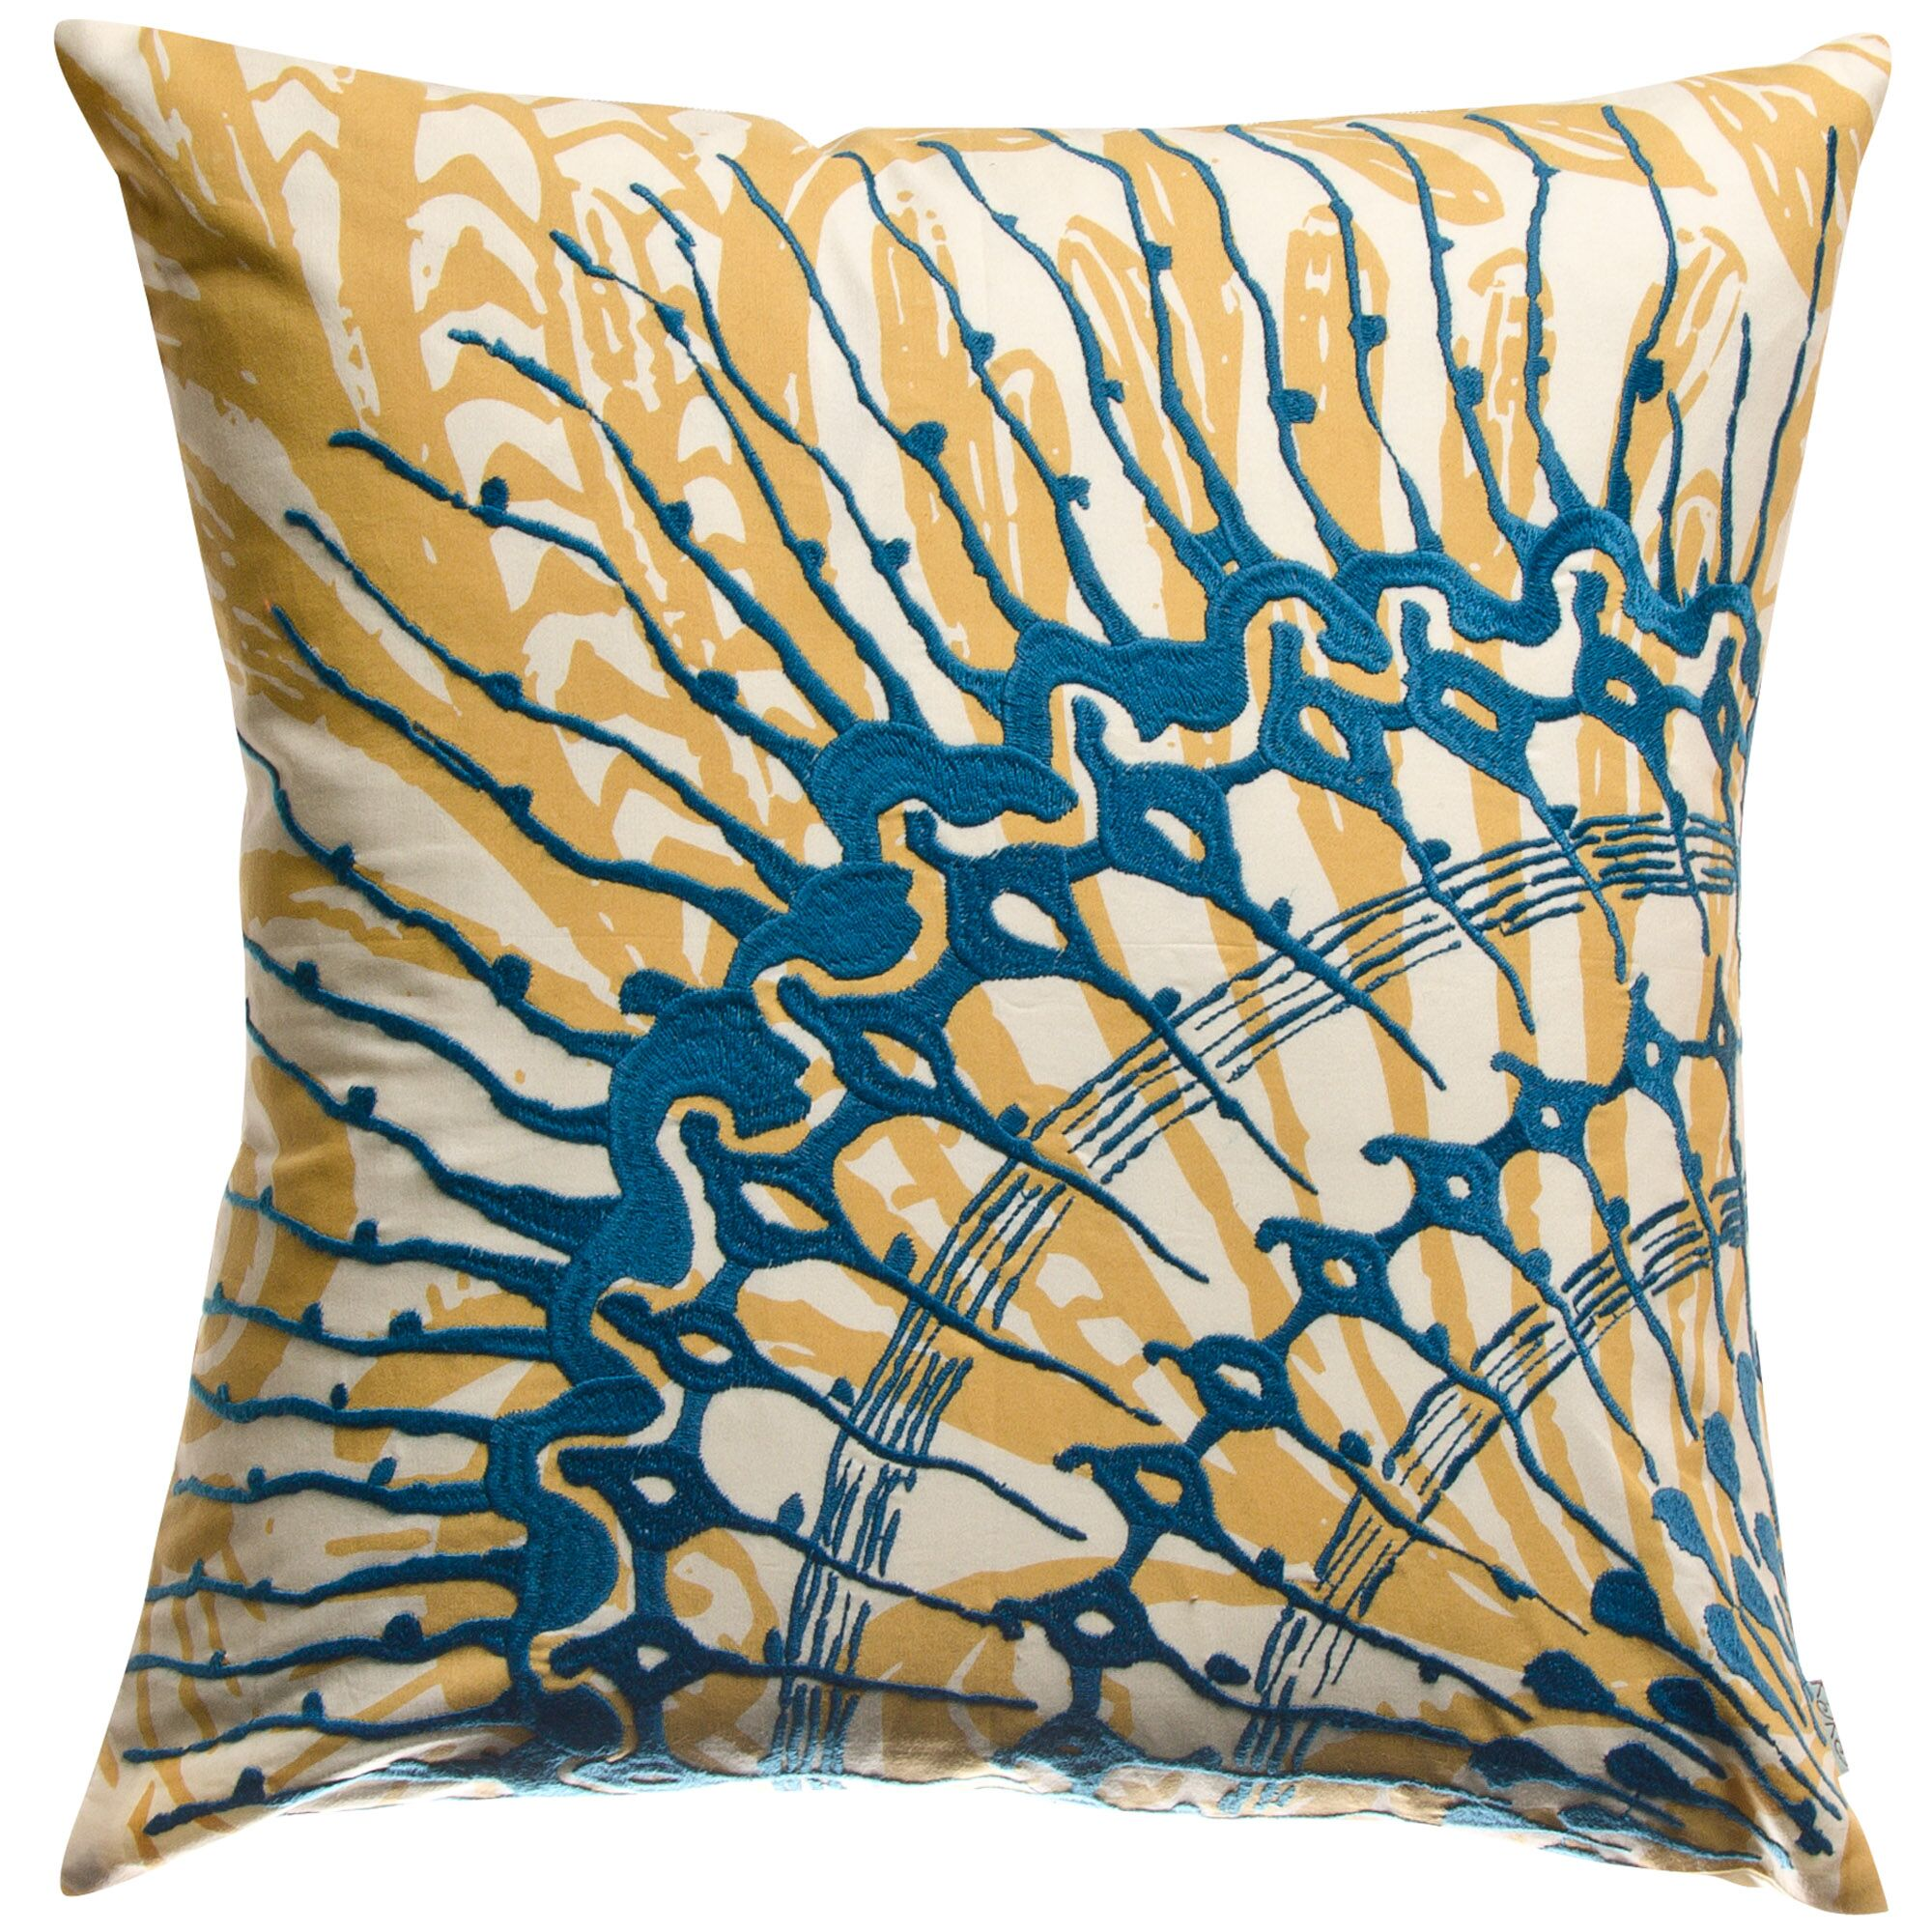 Water Cotton Throw Pillow